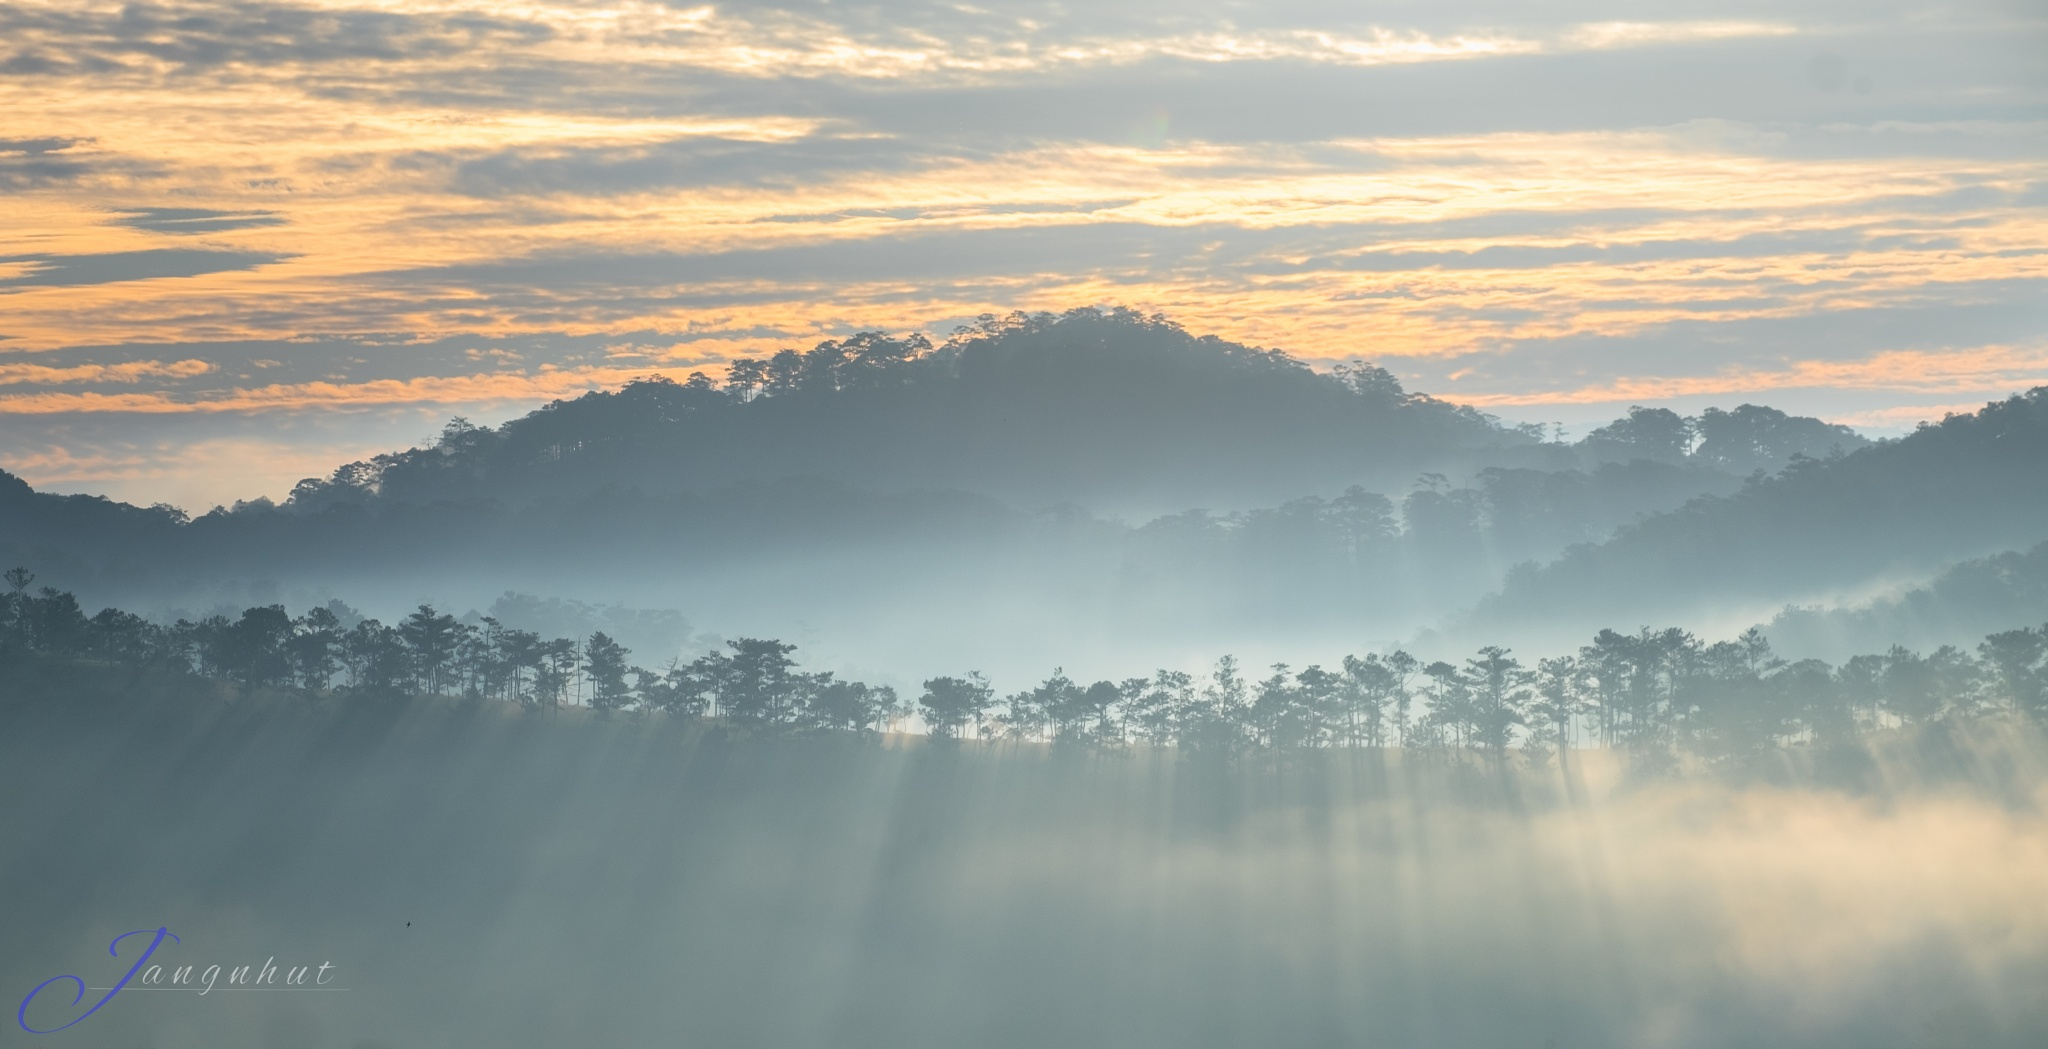 Morning rays by Jangnhut